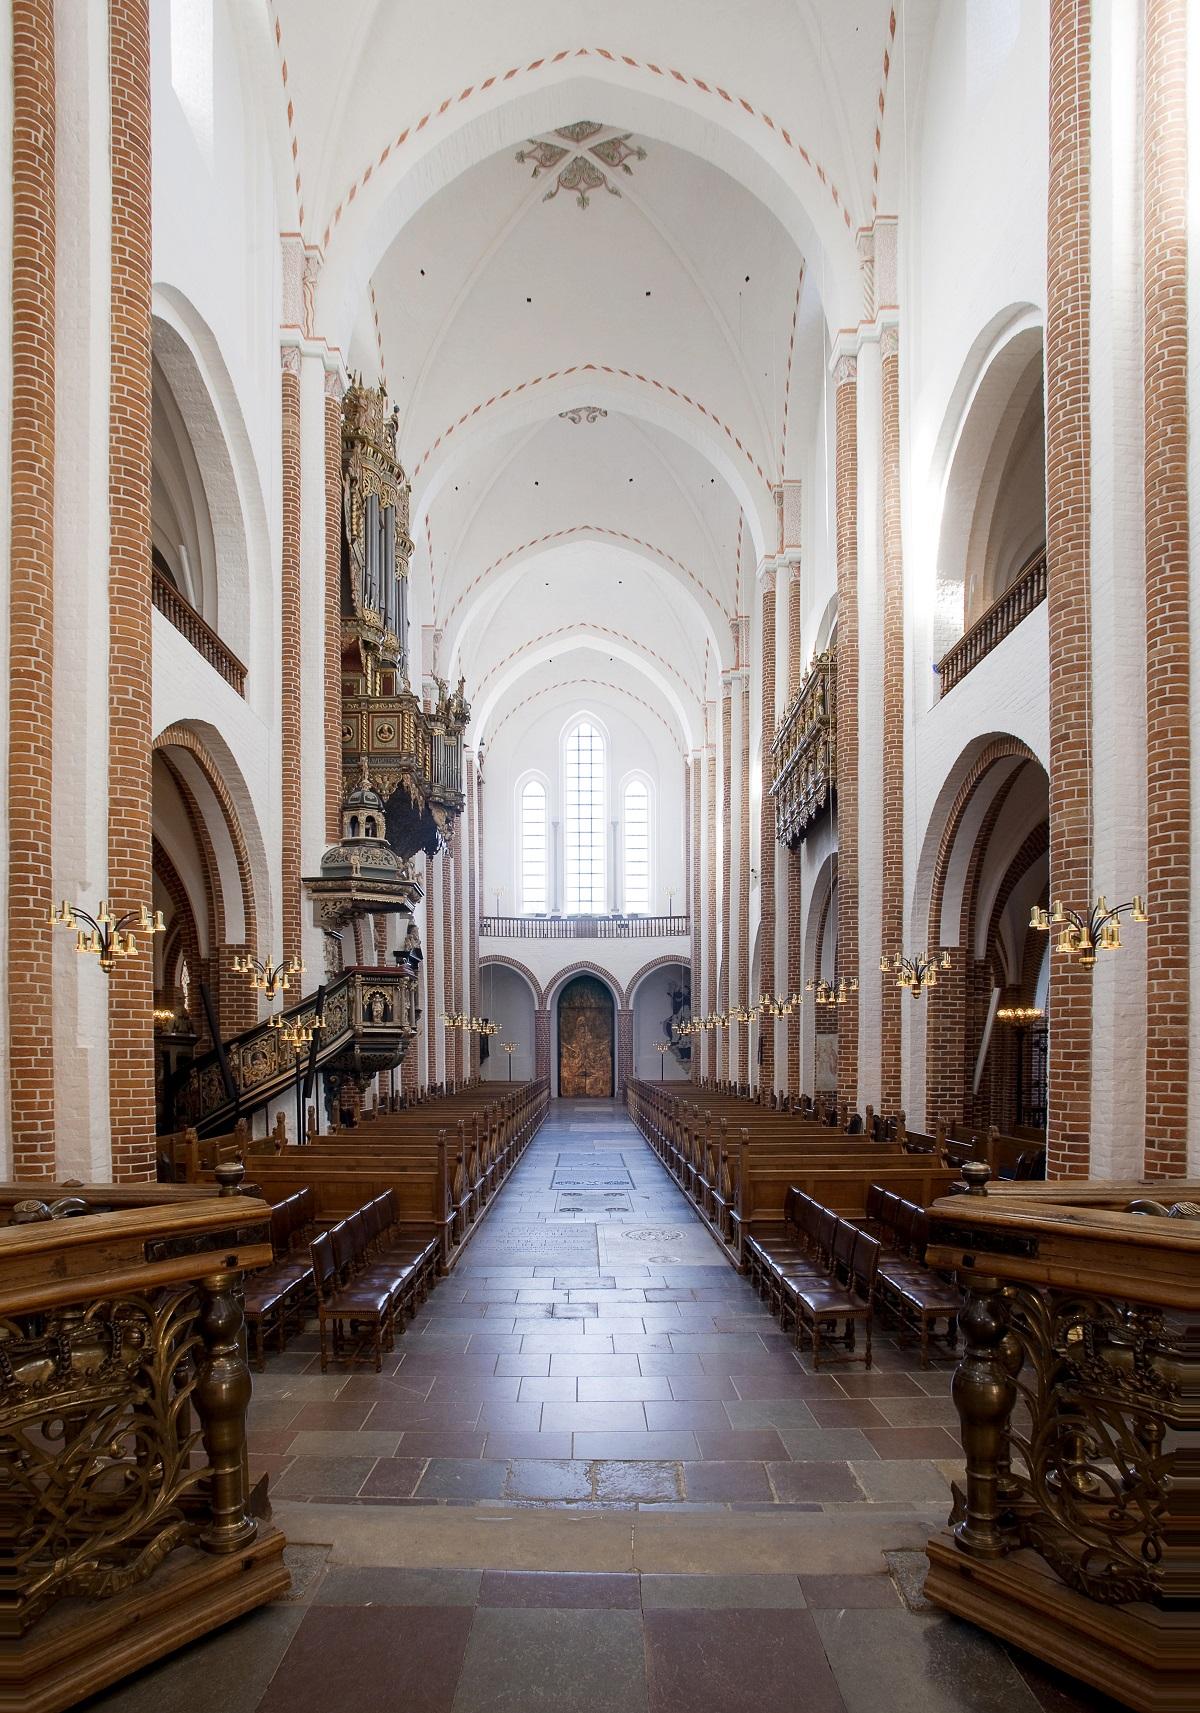 Dom zu Roskilde, Innenraum